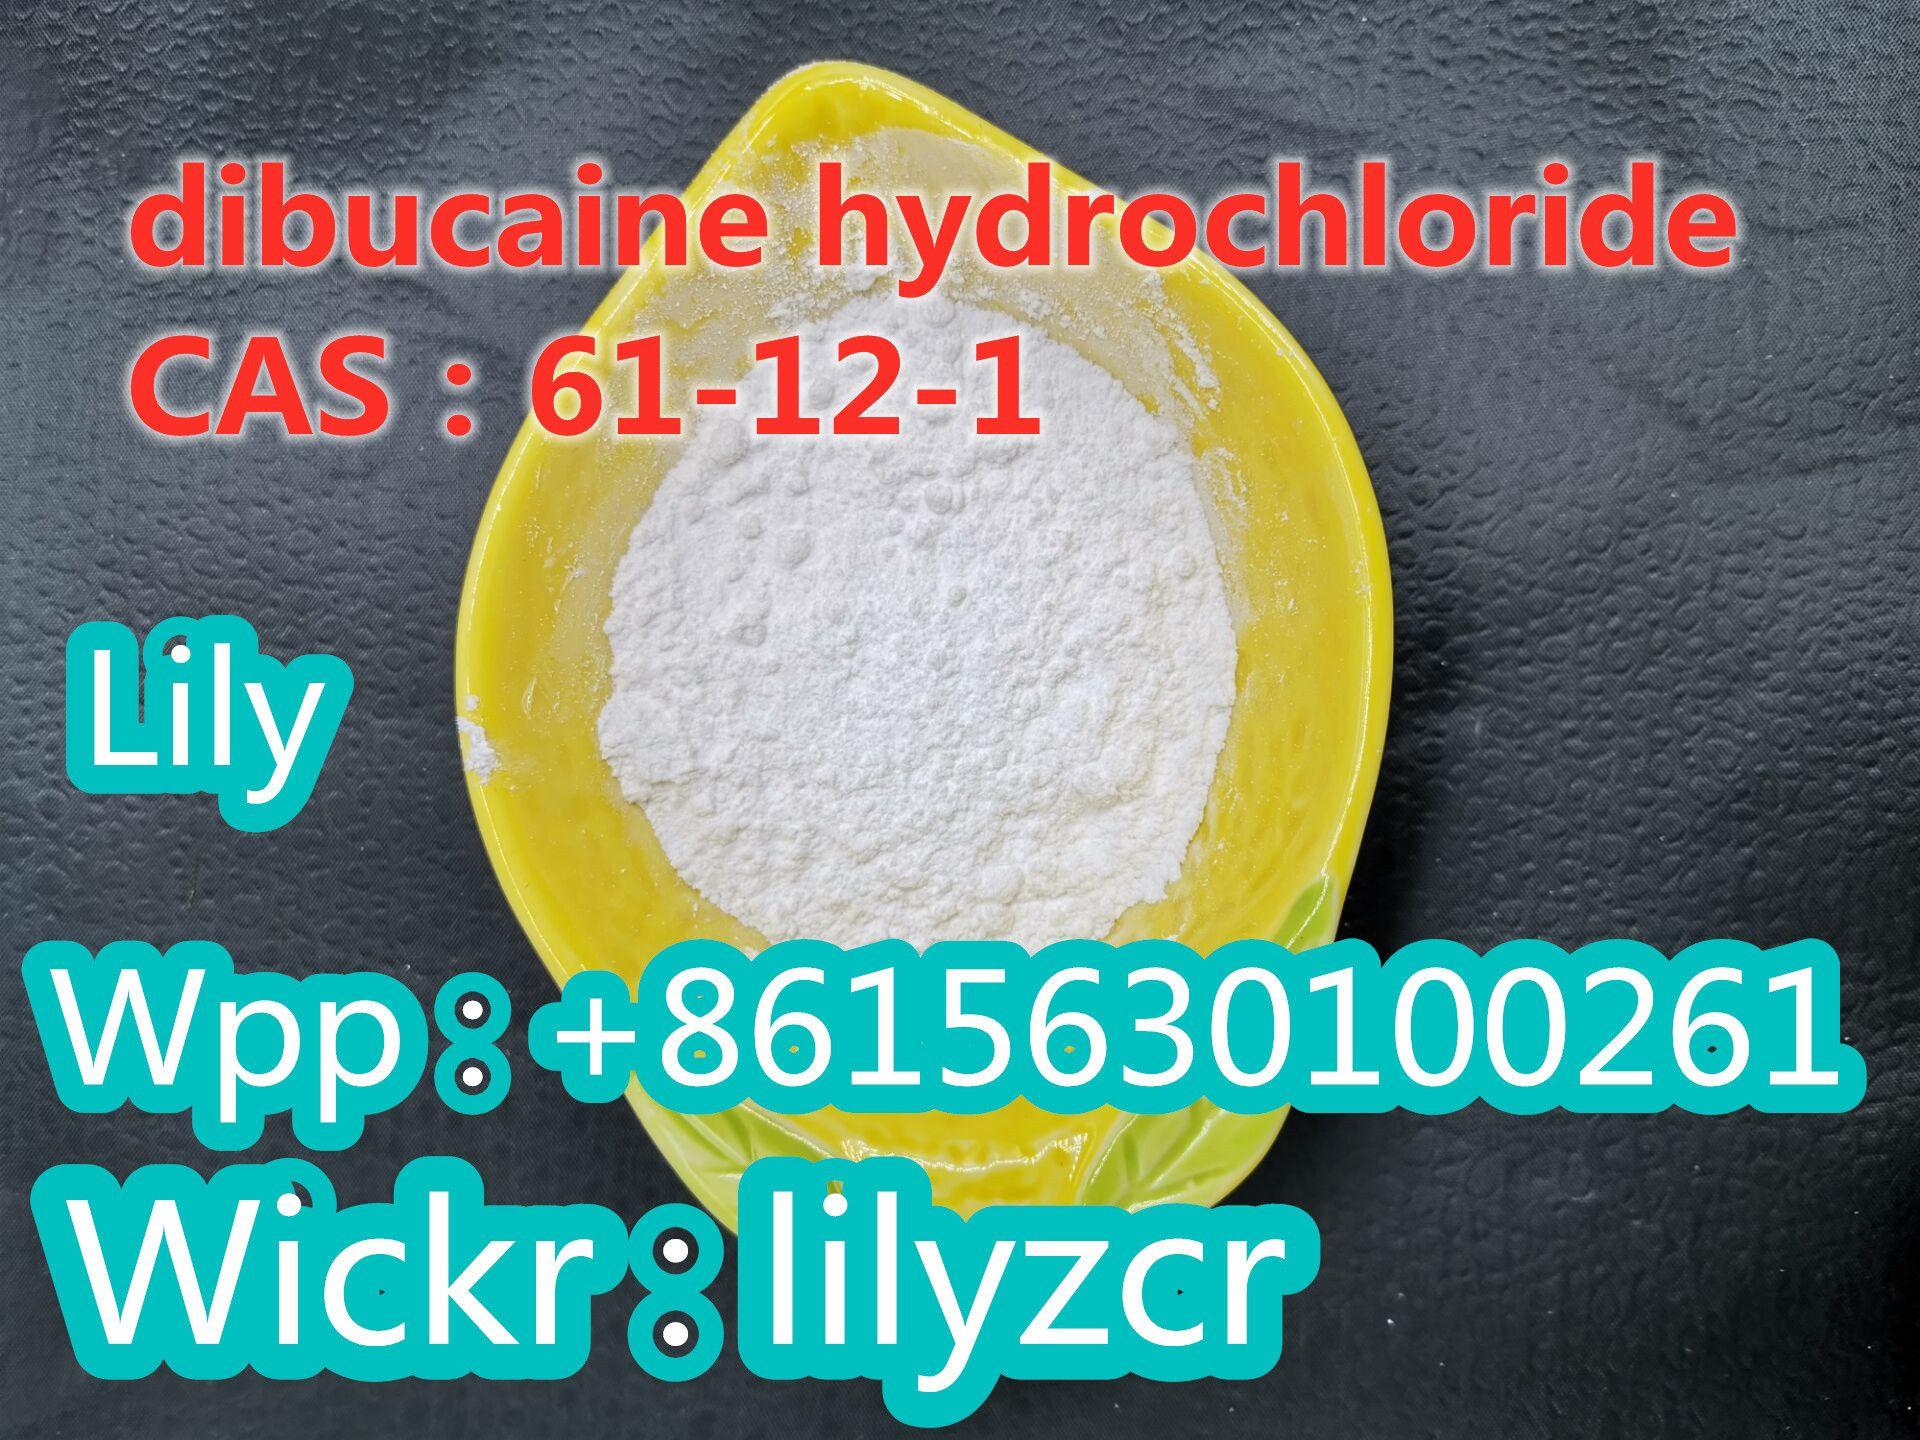 Dibucaine hydrochloride   CAS:61-12-1      Whatsapp:+8615630100261   Wickr:lilyzcr